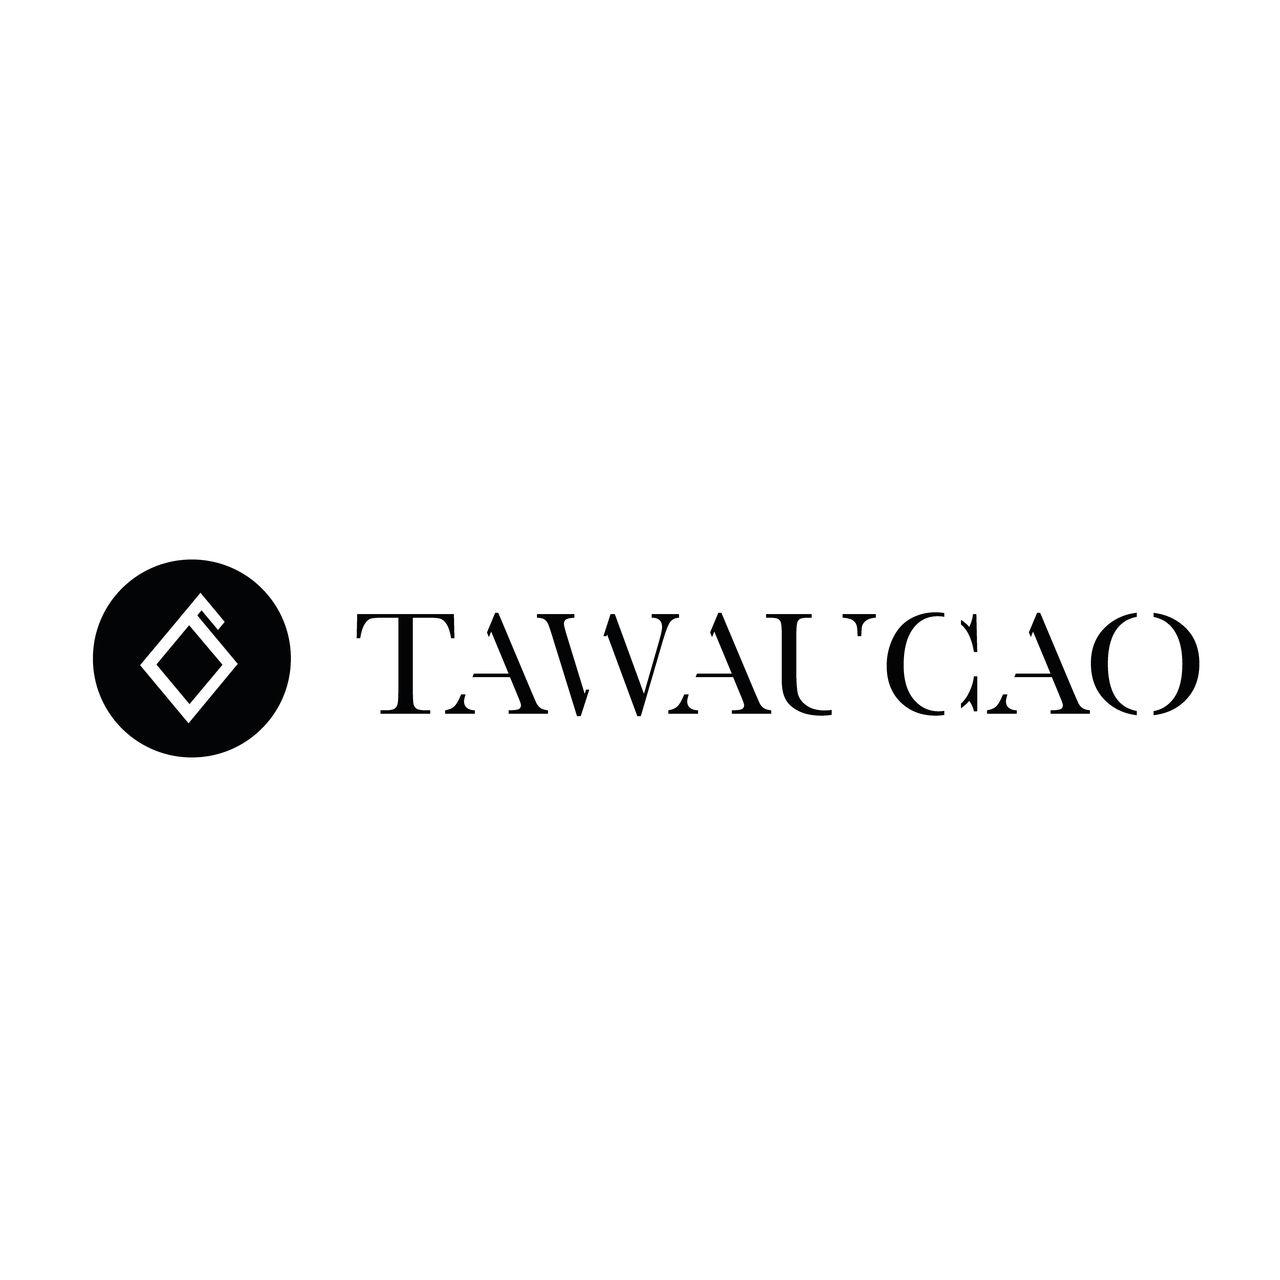 Tawaucao